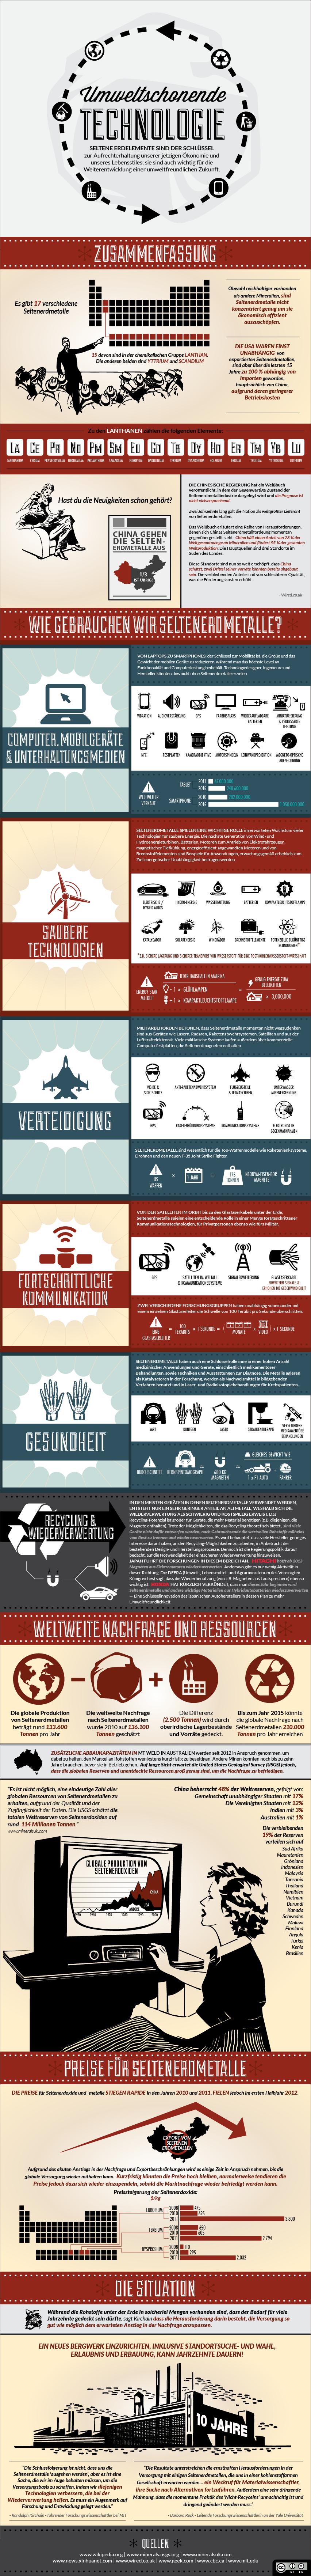 Umweltschonende Technologie-2